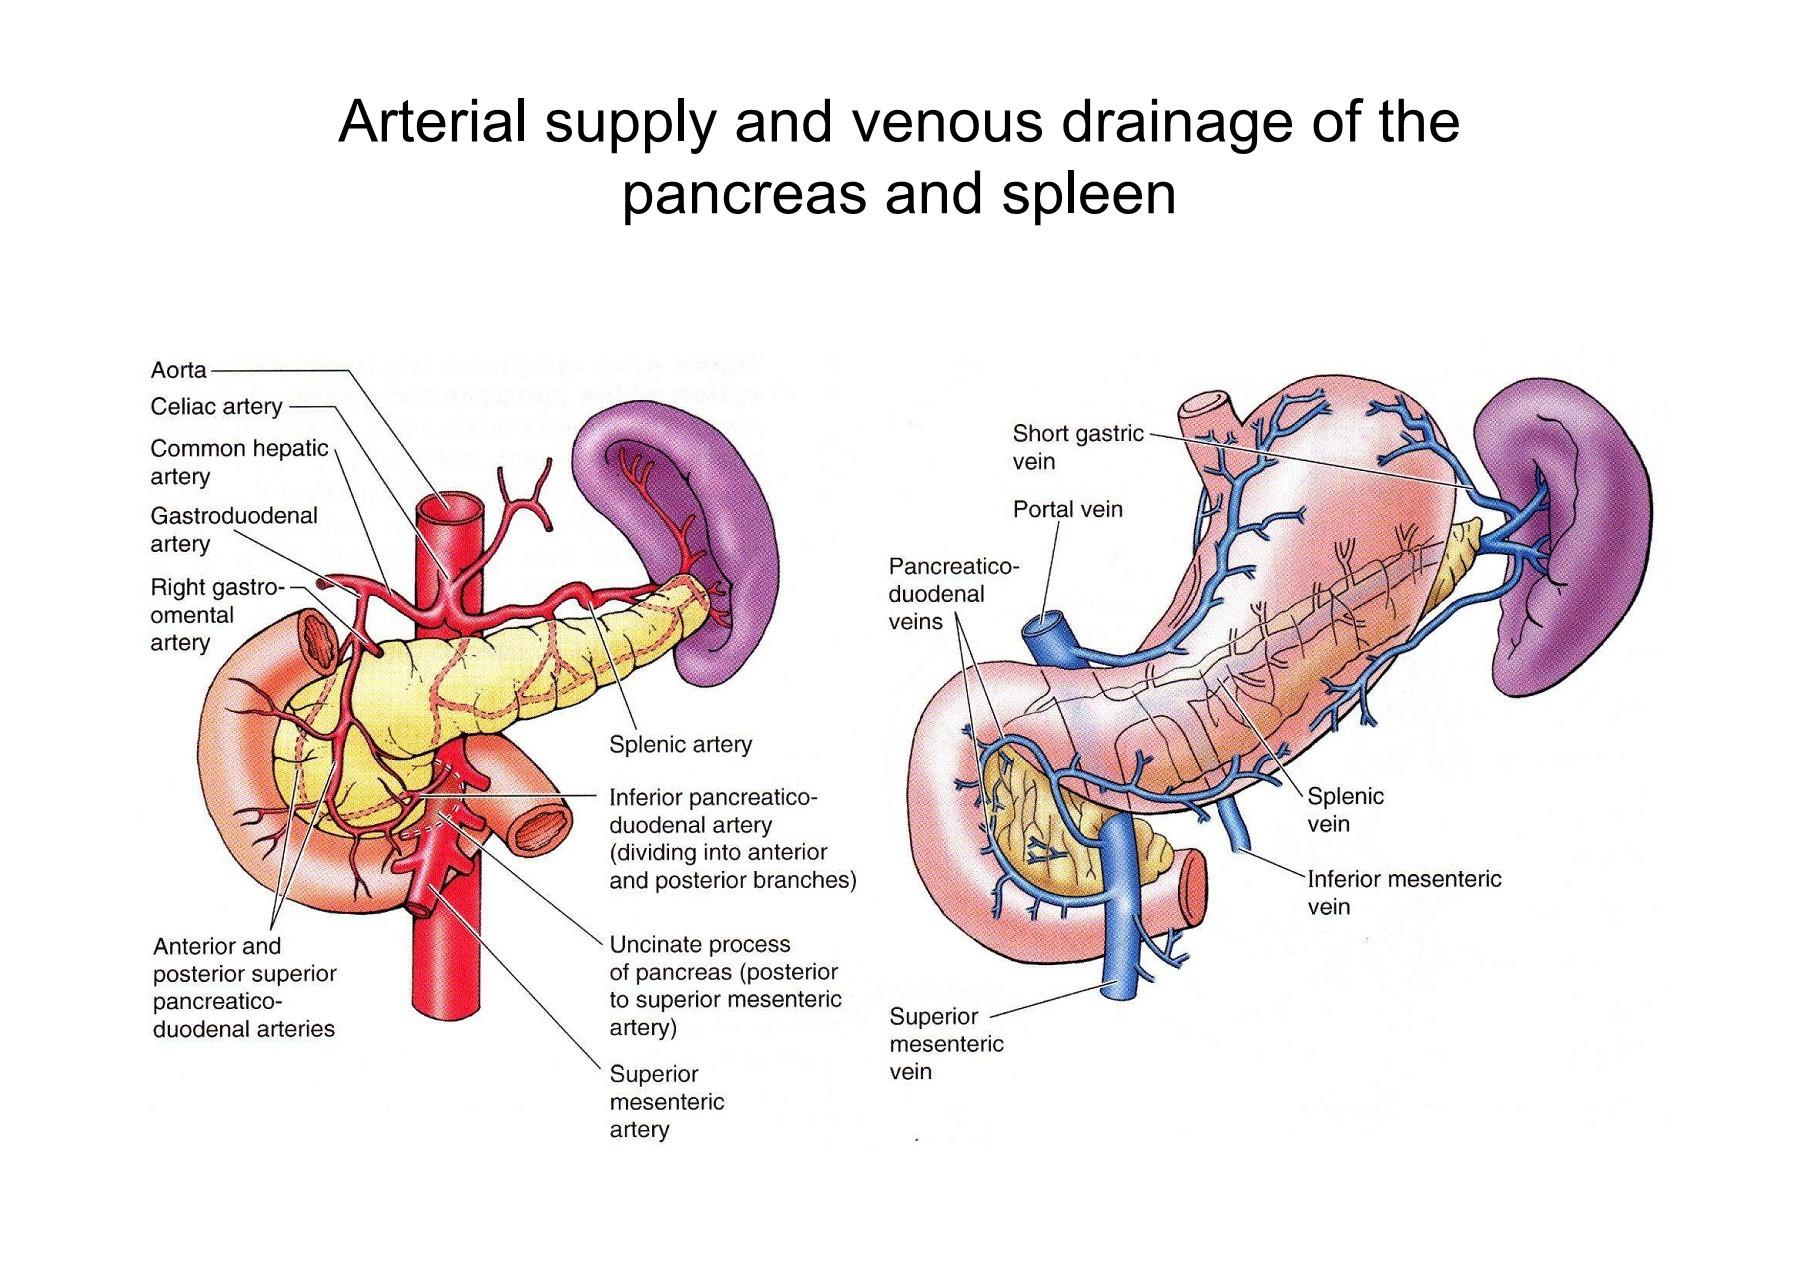 Anatomy of the Duodenum, Pancreas and Spleen | Focusky